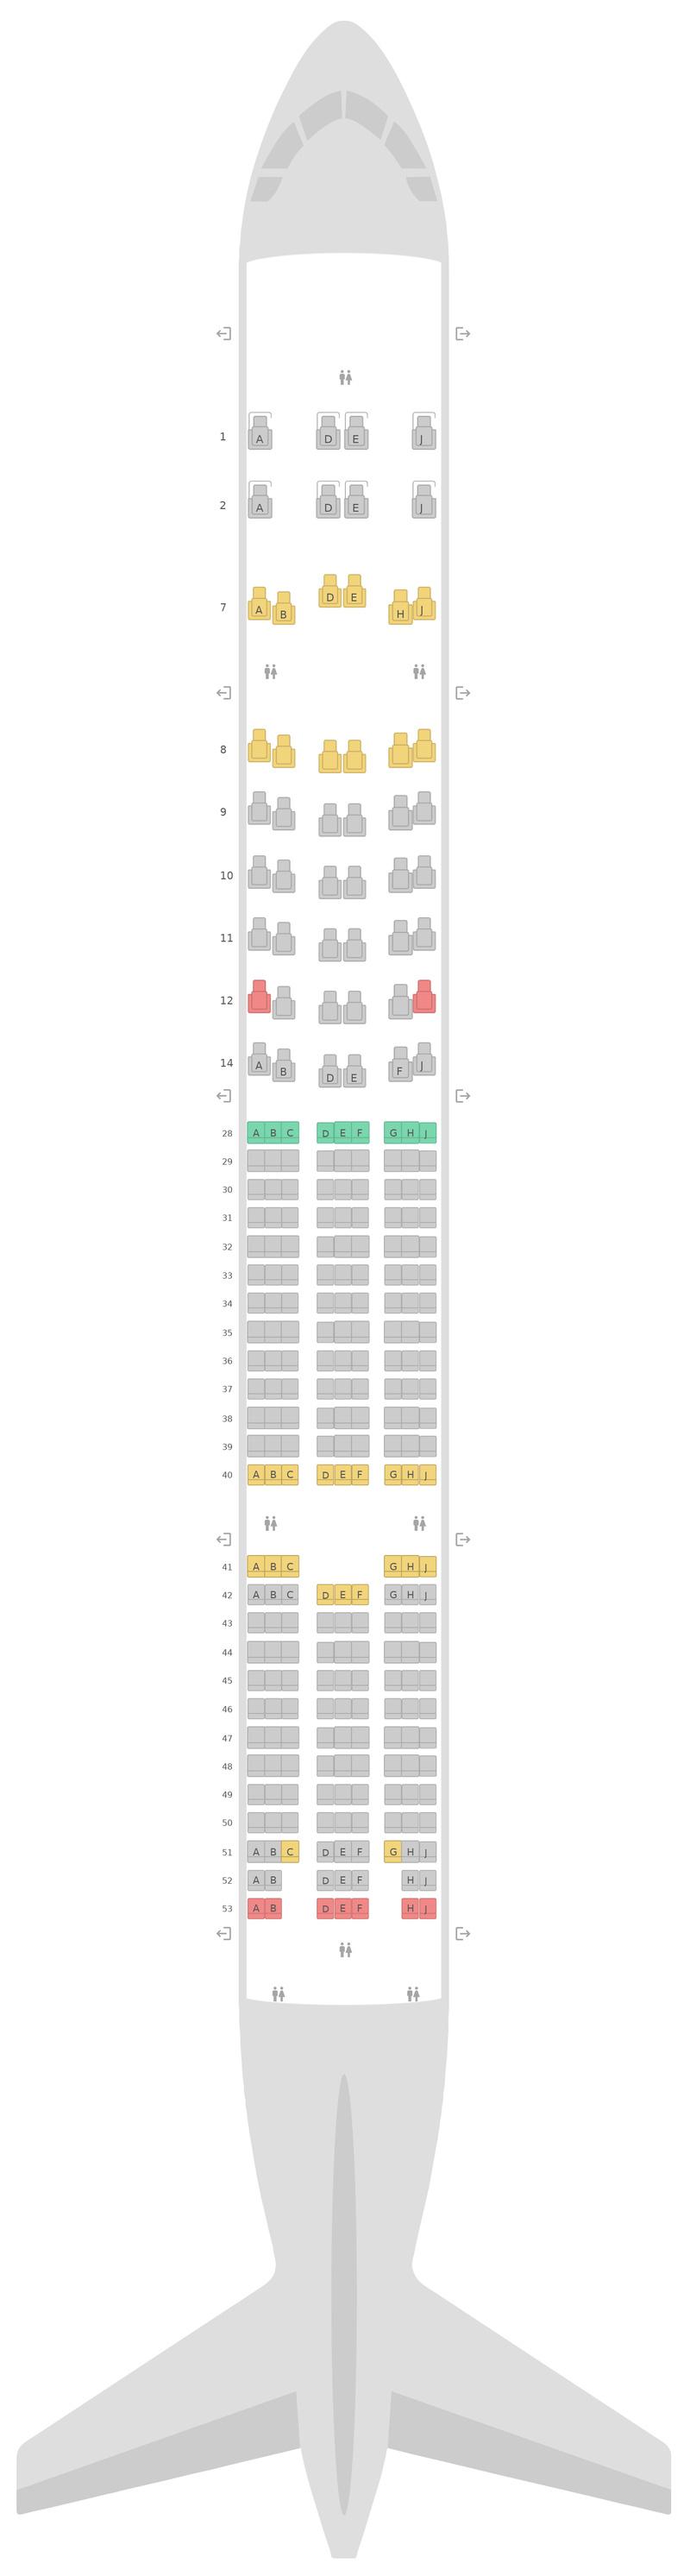 Схема салона Боинг 777-300ER (77W) v2 Корейские Авиалинии